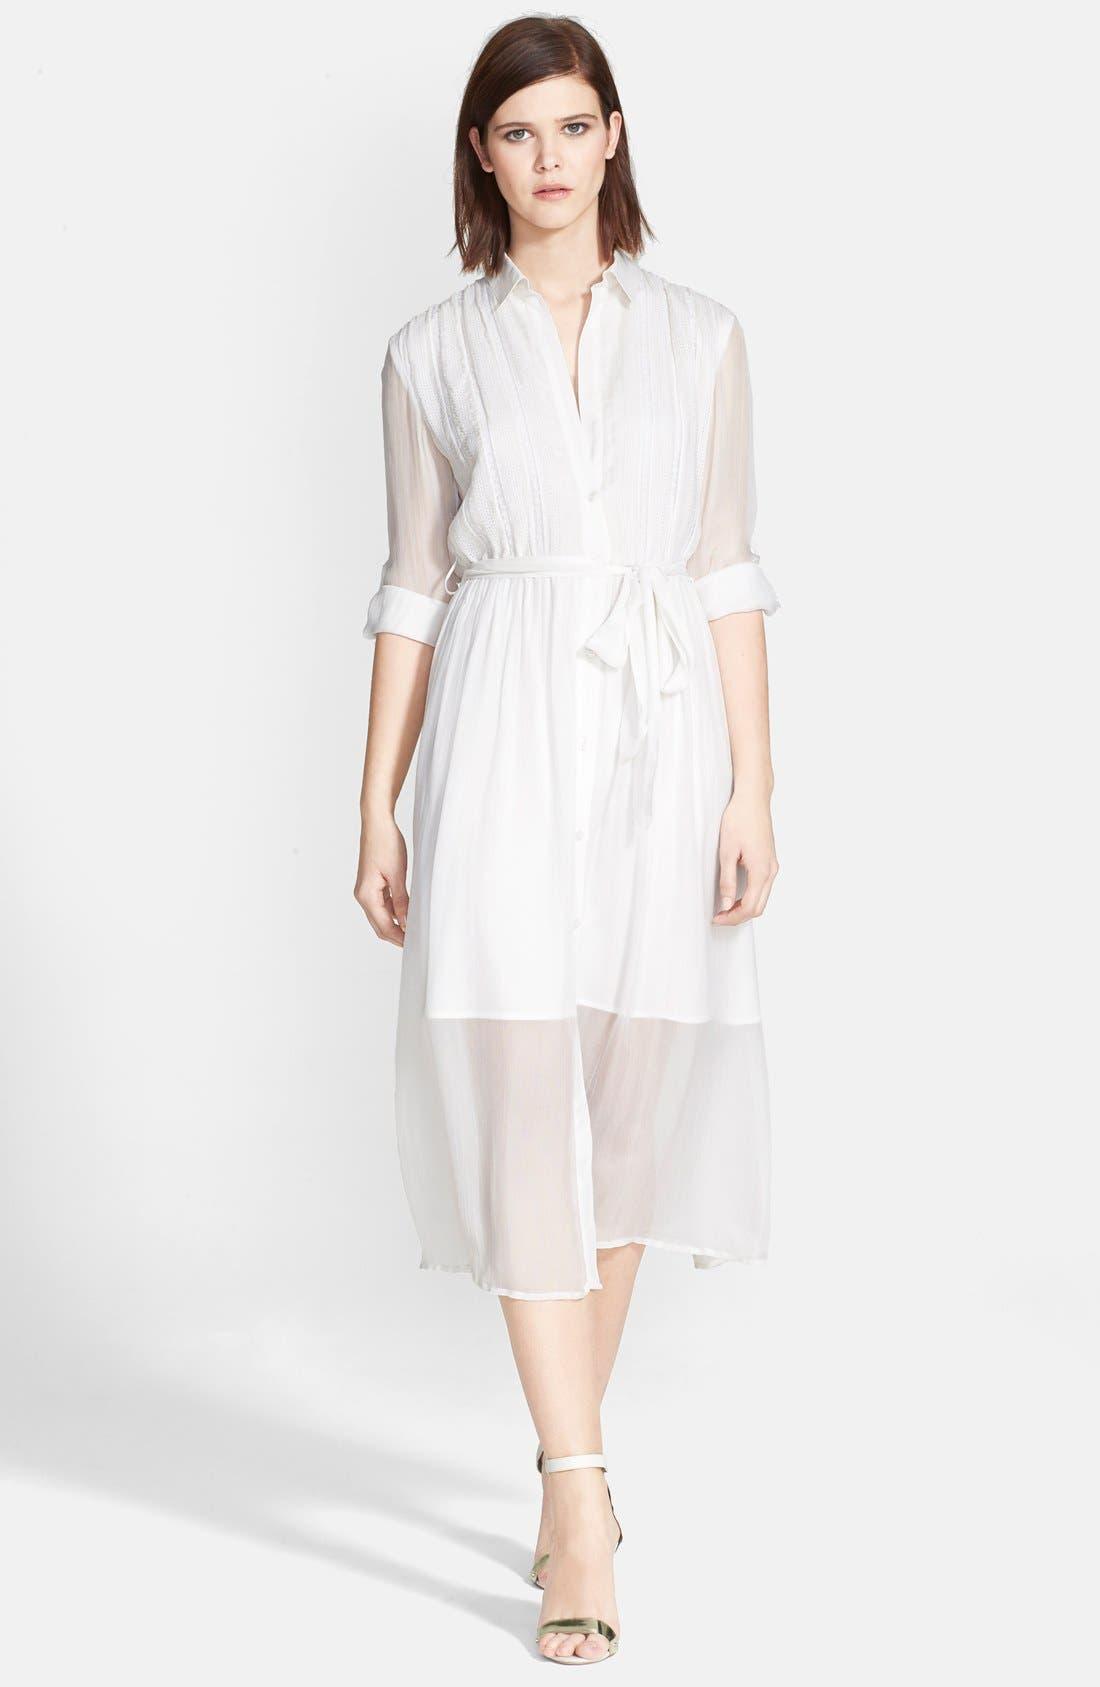 Alternate Image 1 Selected - Alice + Olivia 'Maia' Belted Shirtdress